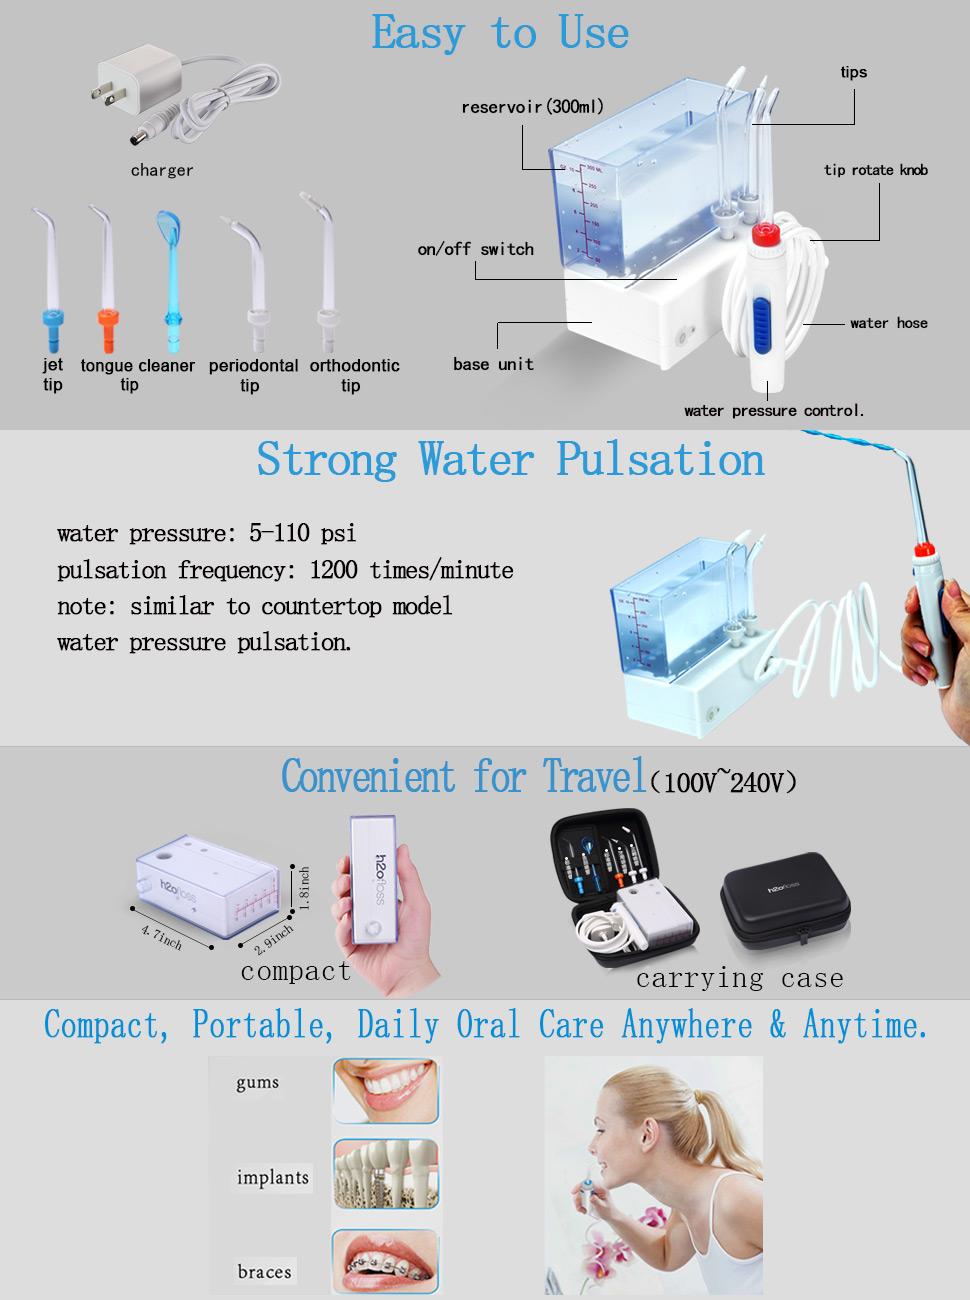 H2ofloss Travel Dental Flosser Review (HF-3 Premium) • Water Flosser